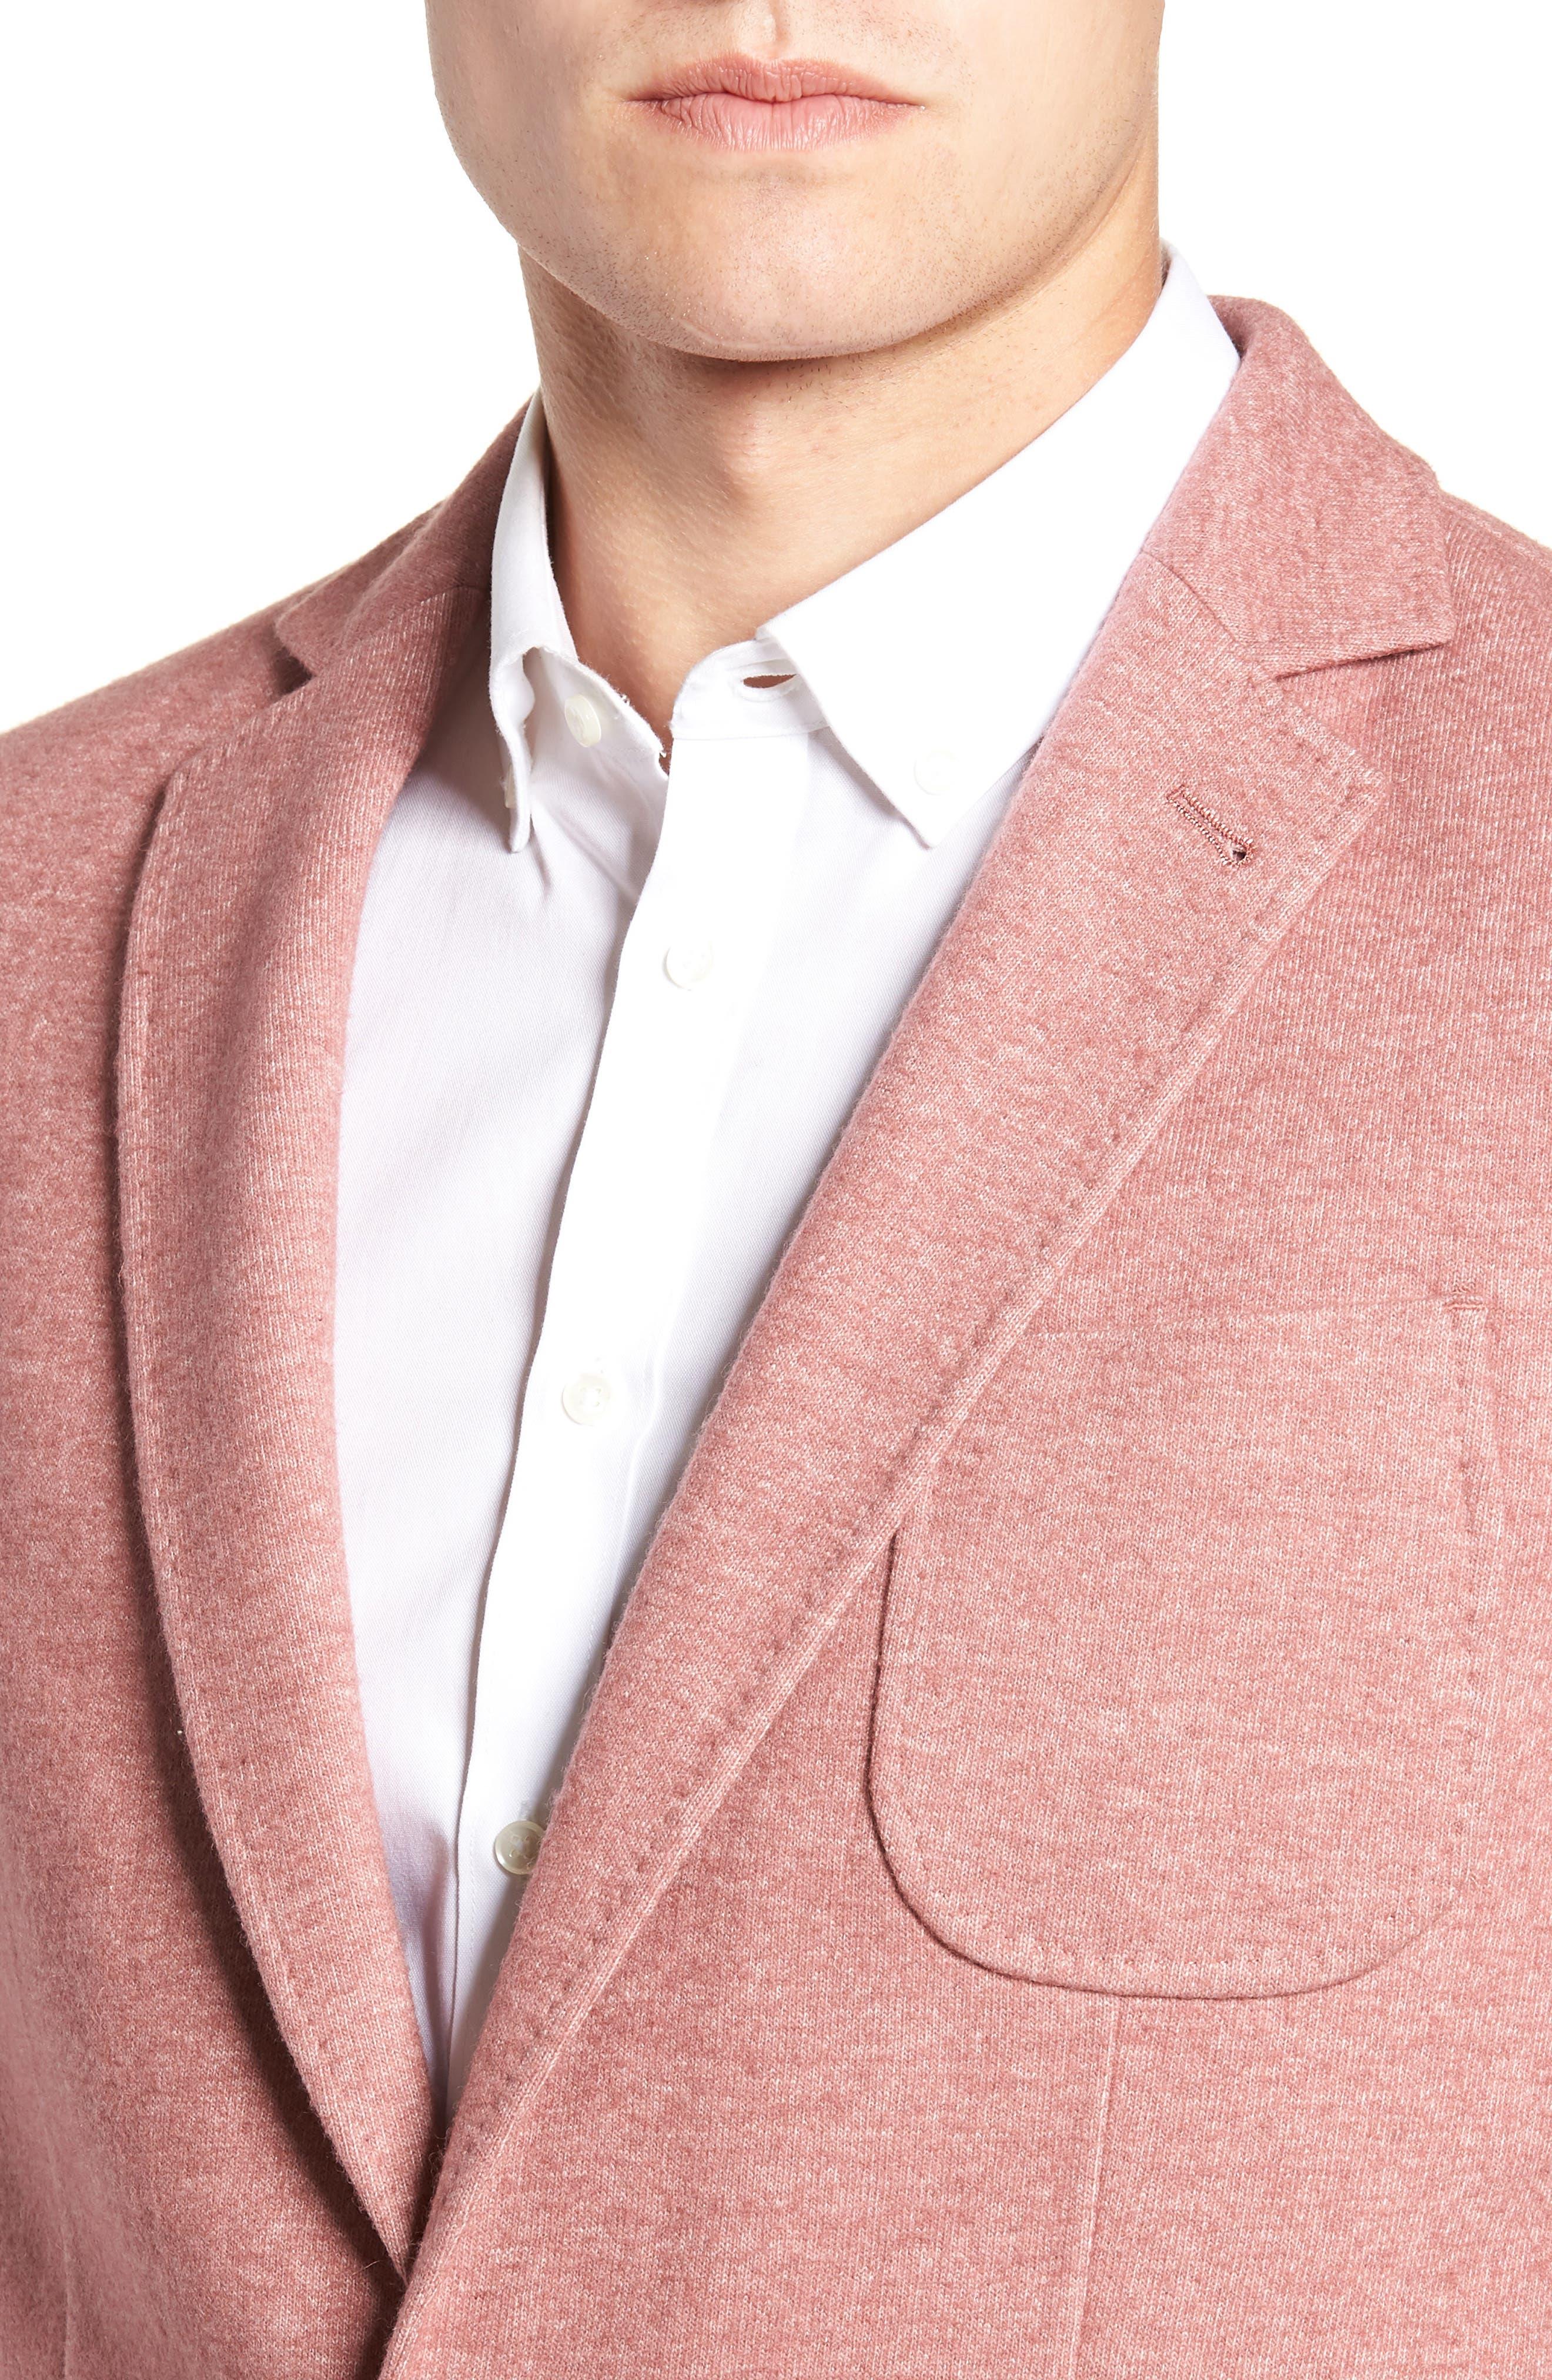 Regular Fit Knit Wool Blend Sport Coat,                             Alternate thumbnail 4, color,                             PINK